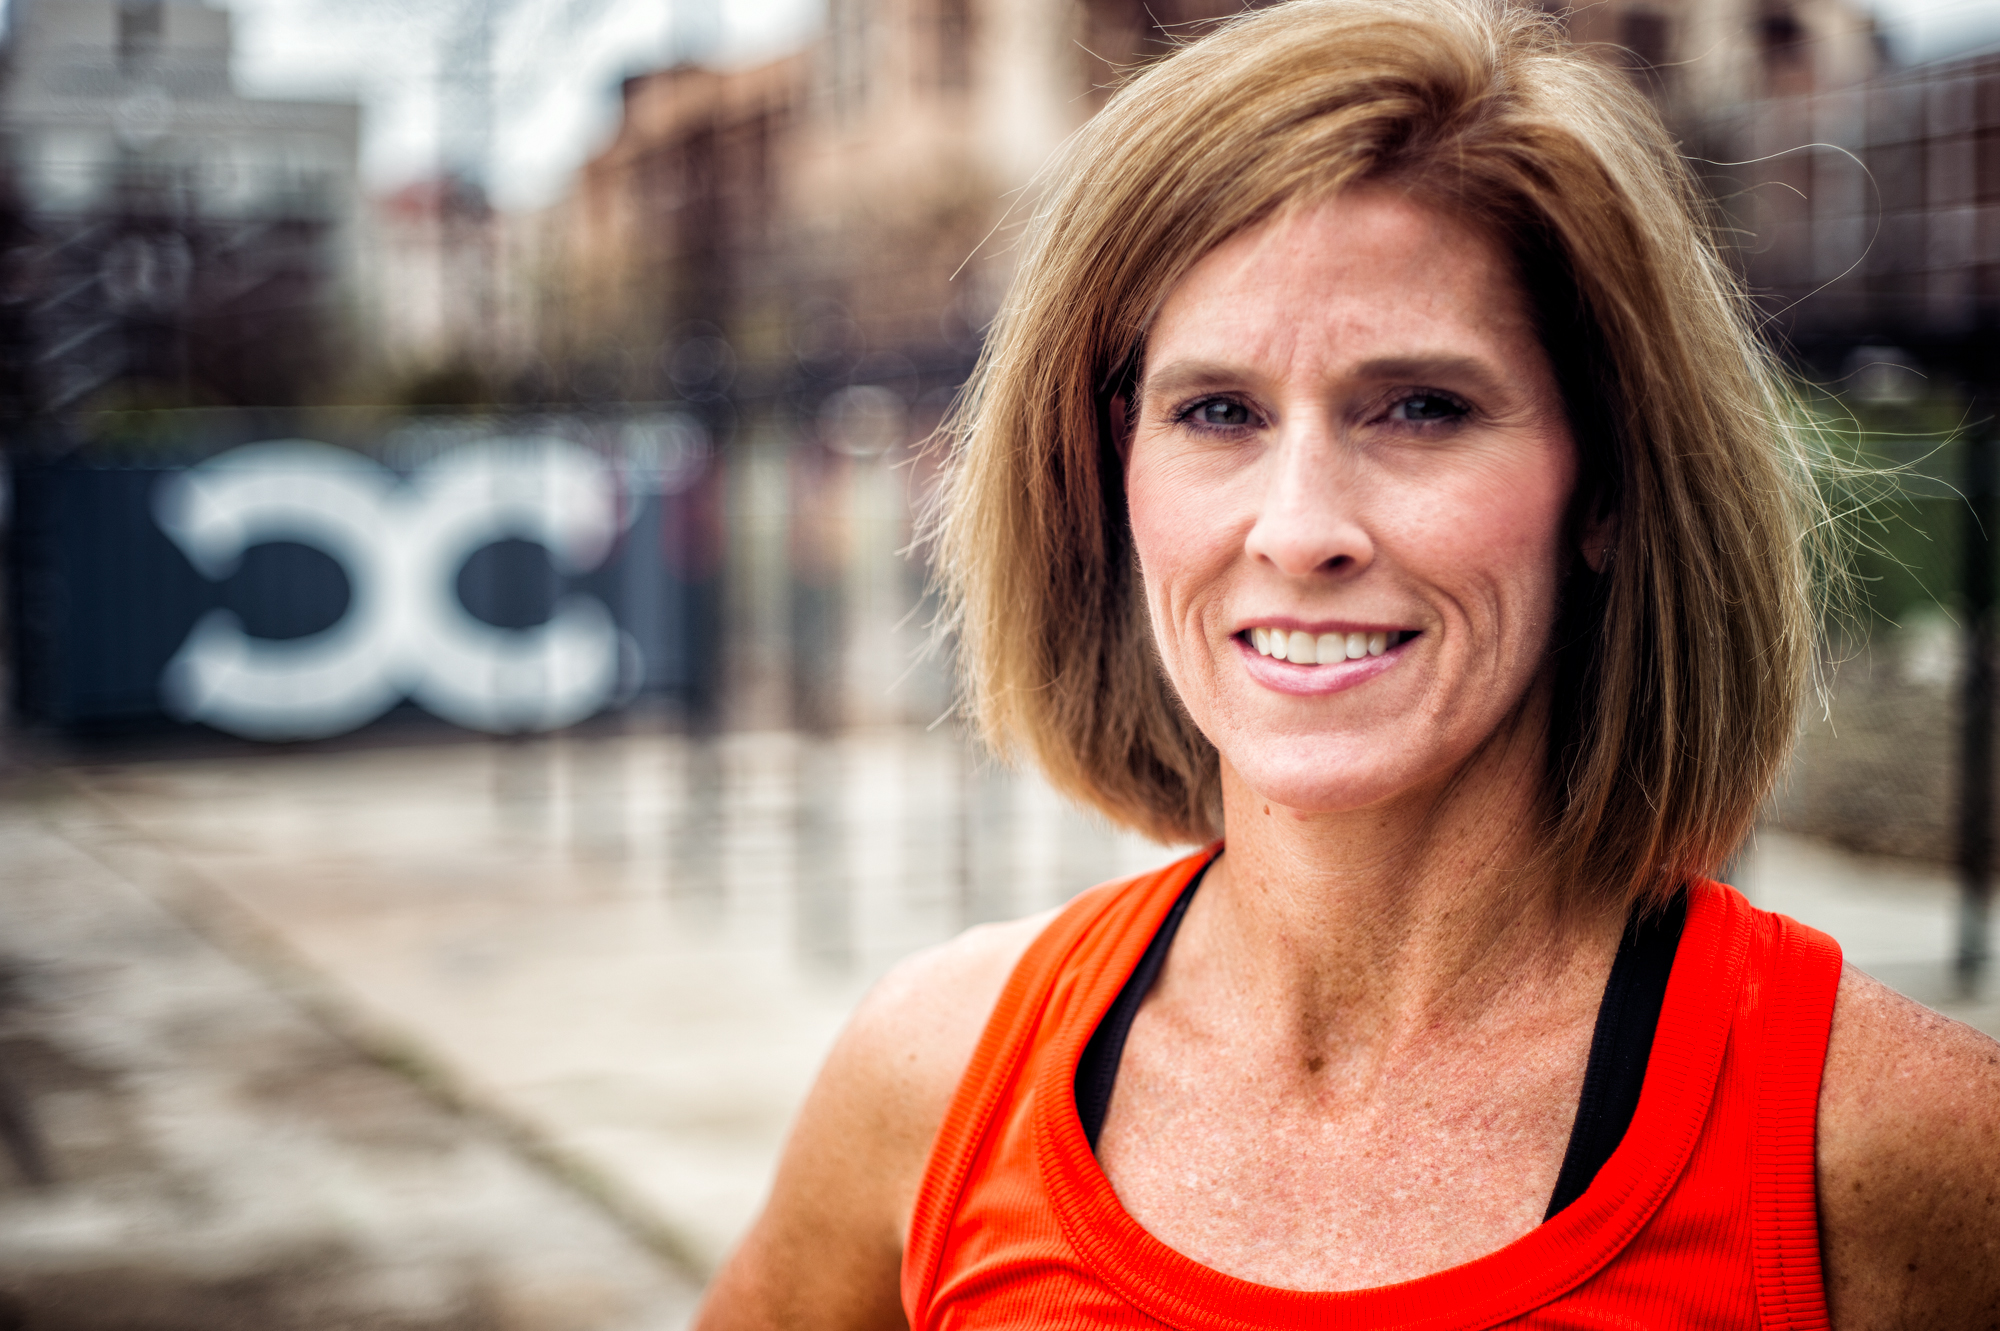 2012 Relentless Success Story: Cindy L.